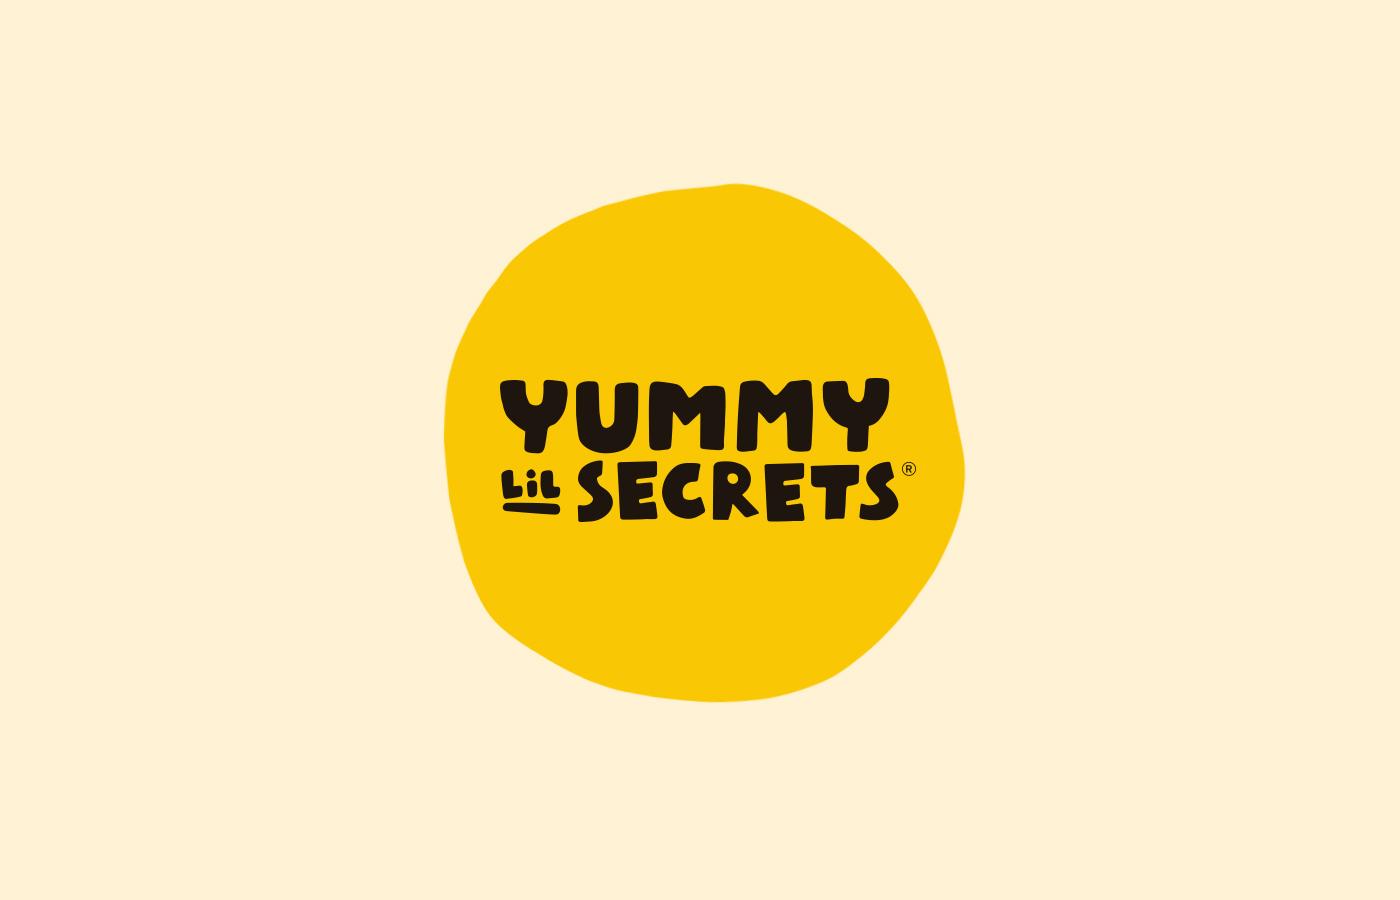 Yummy Little Secrets